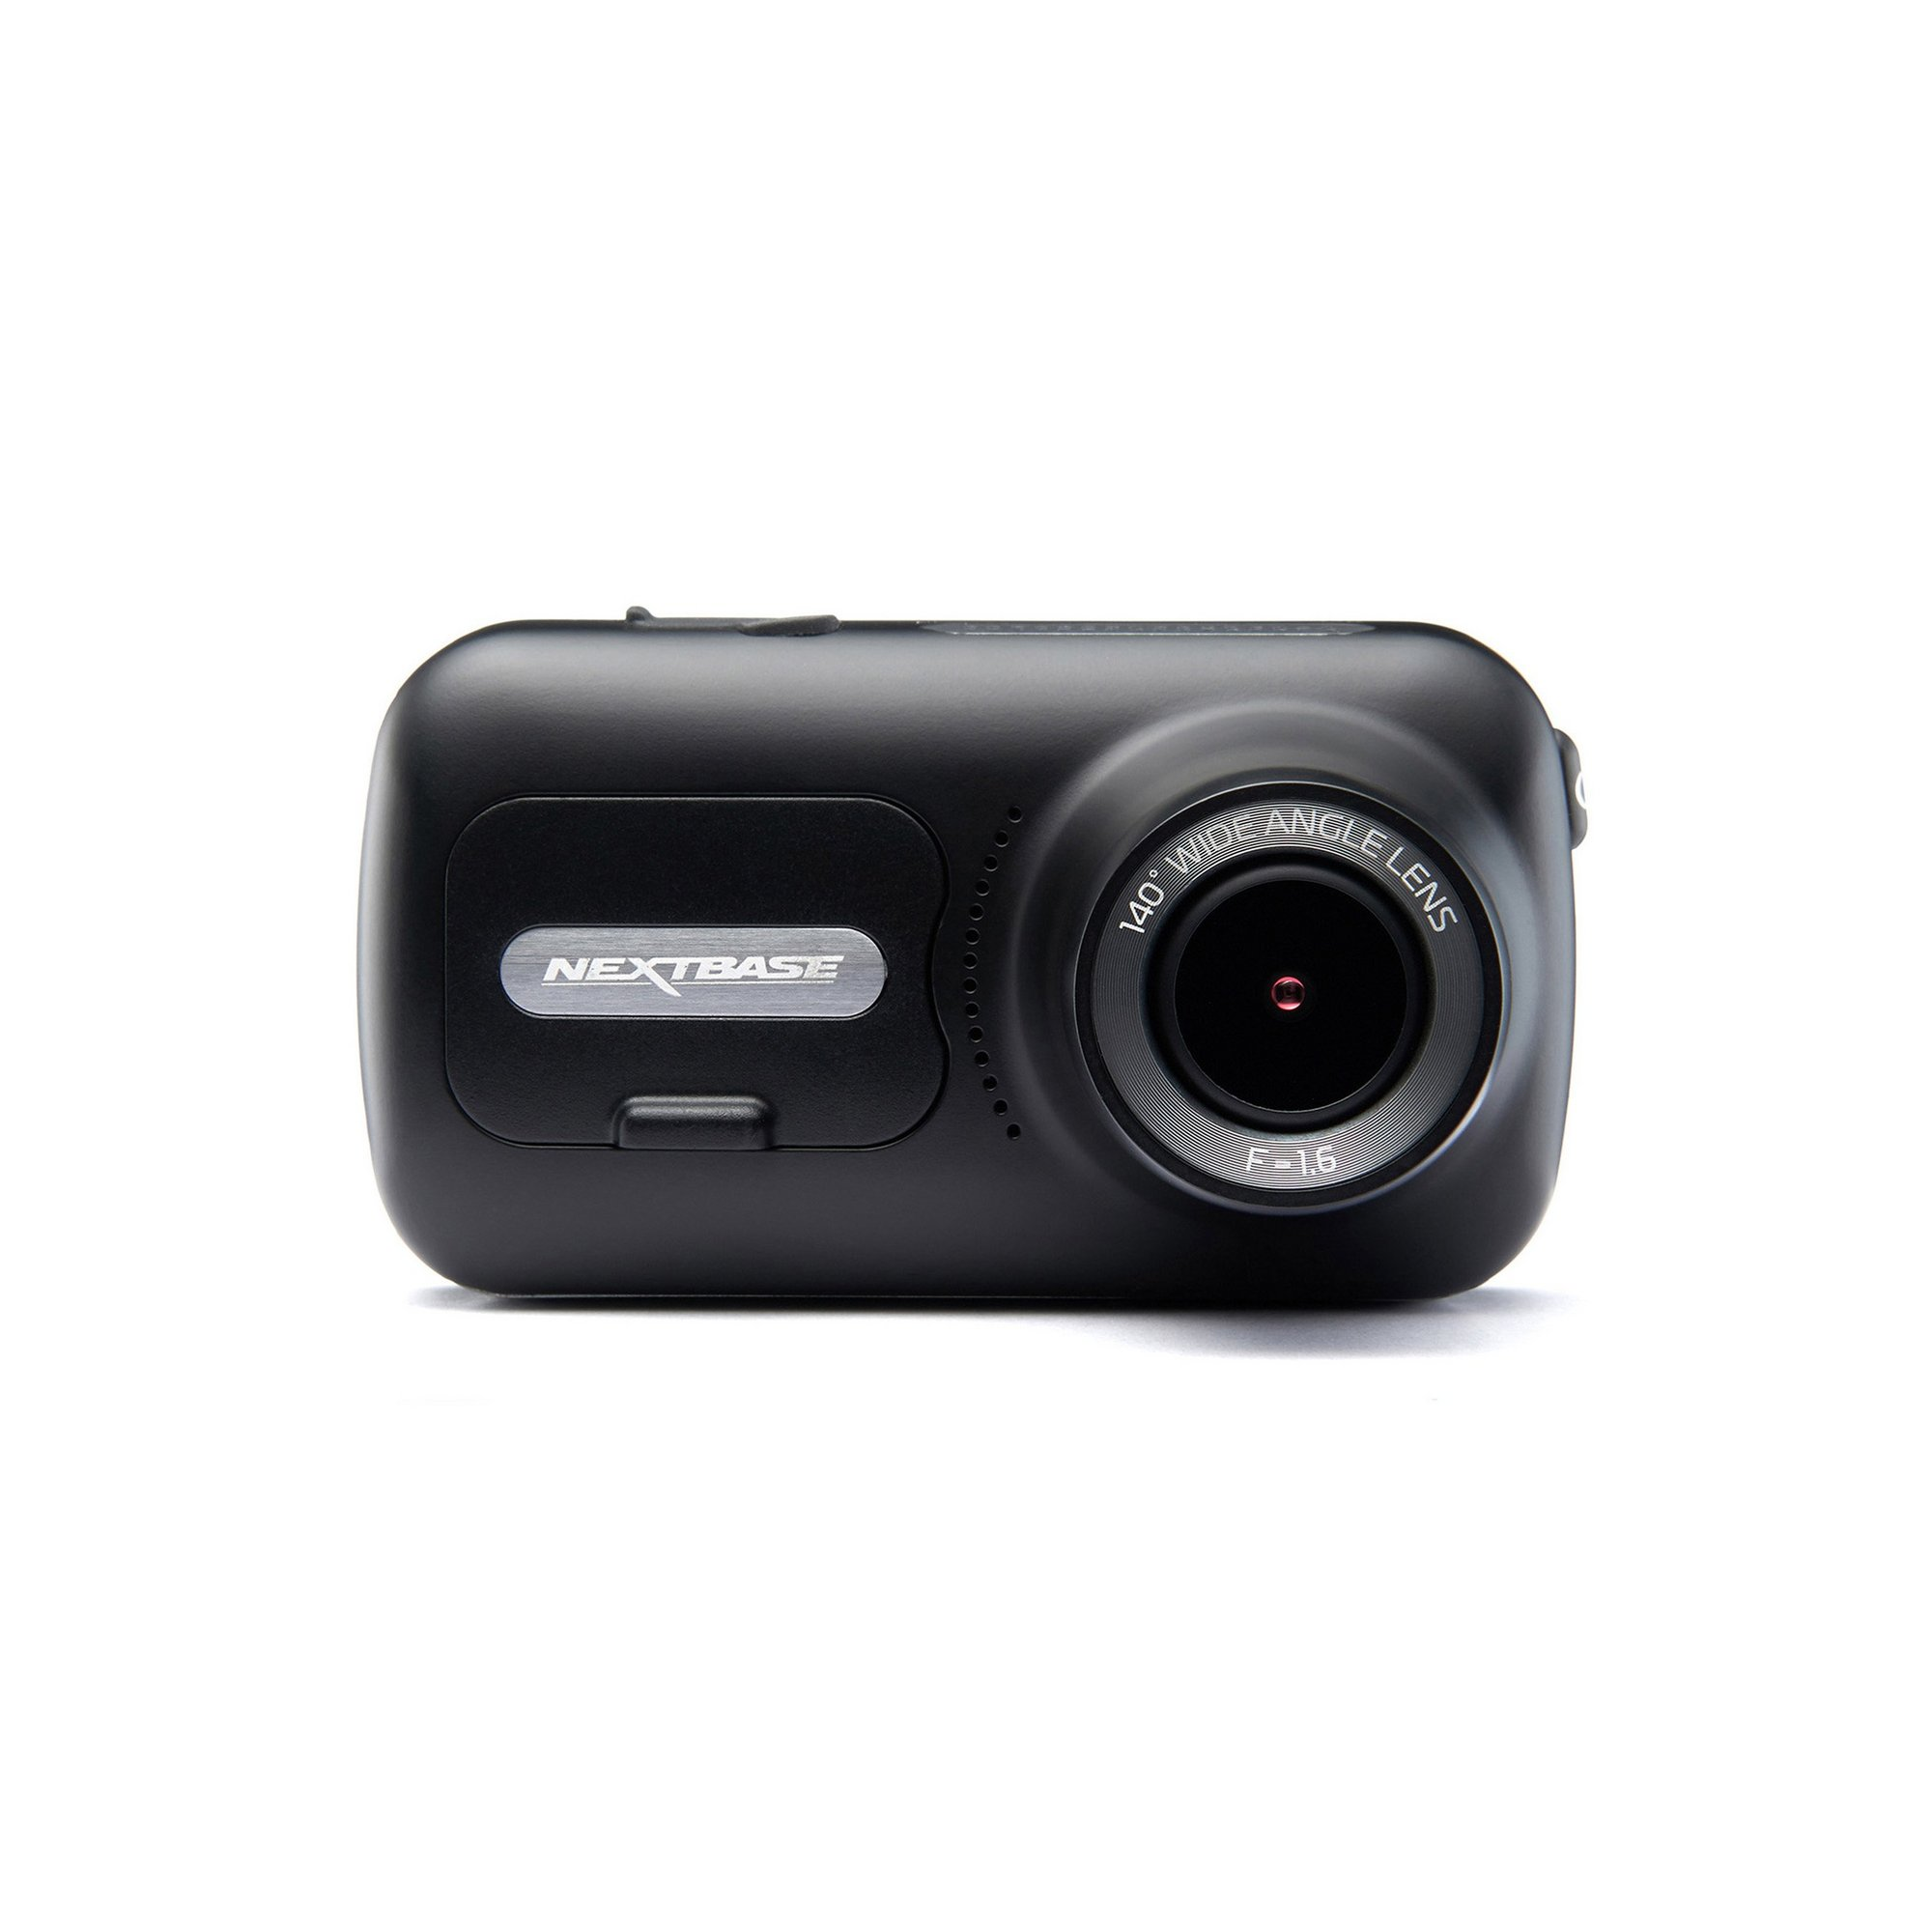 Image of Nextbase 322GW FHD 2.5 Inch Touch Wi-Fi BT Dash Cam